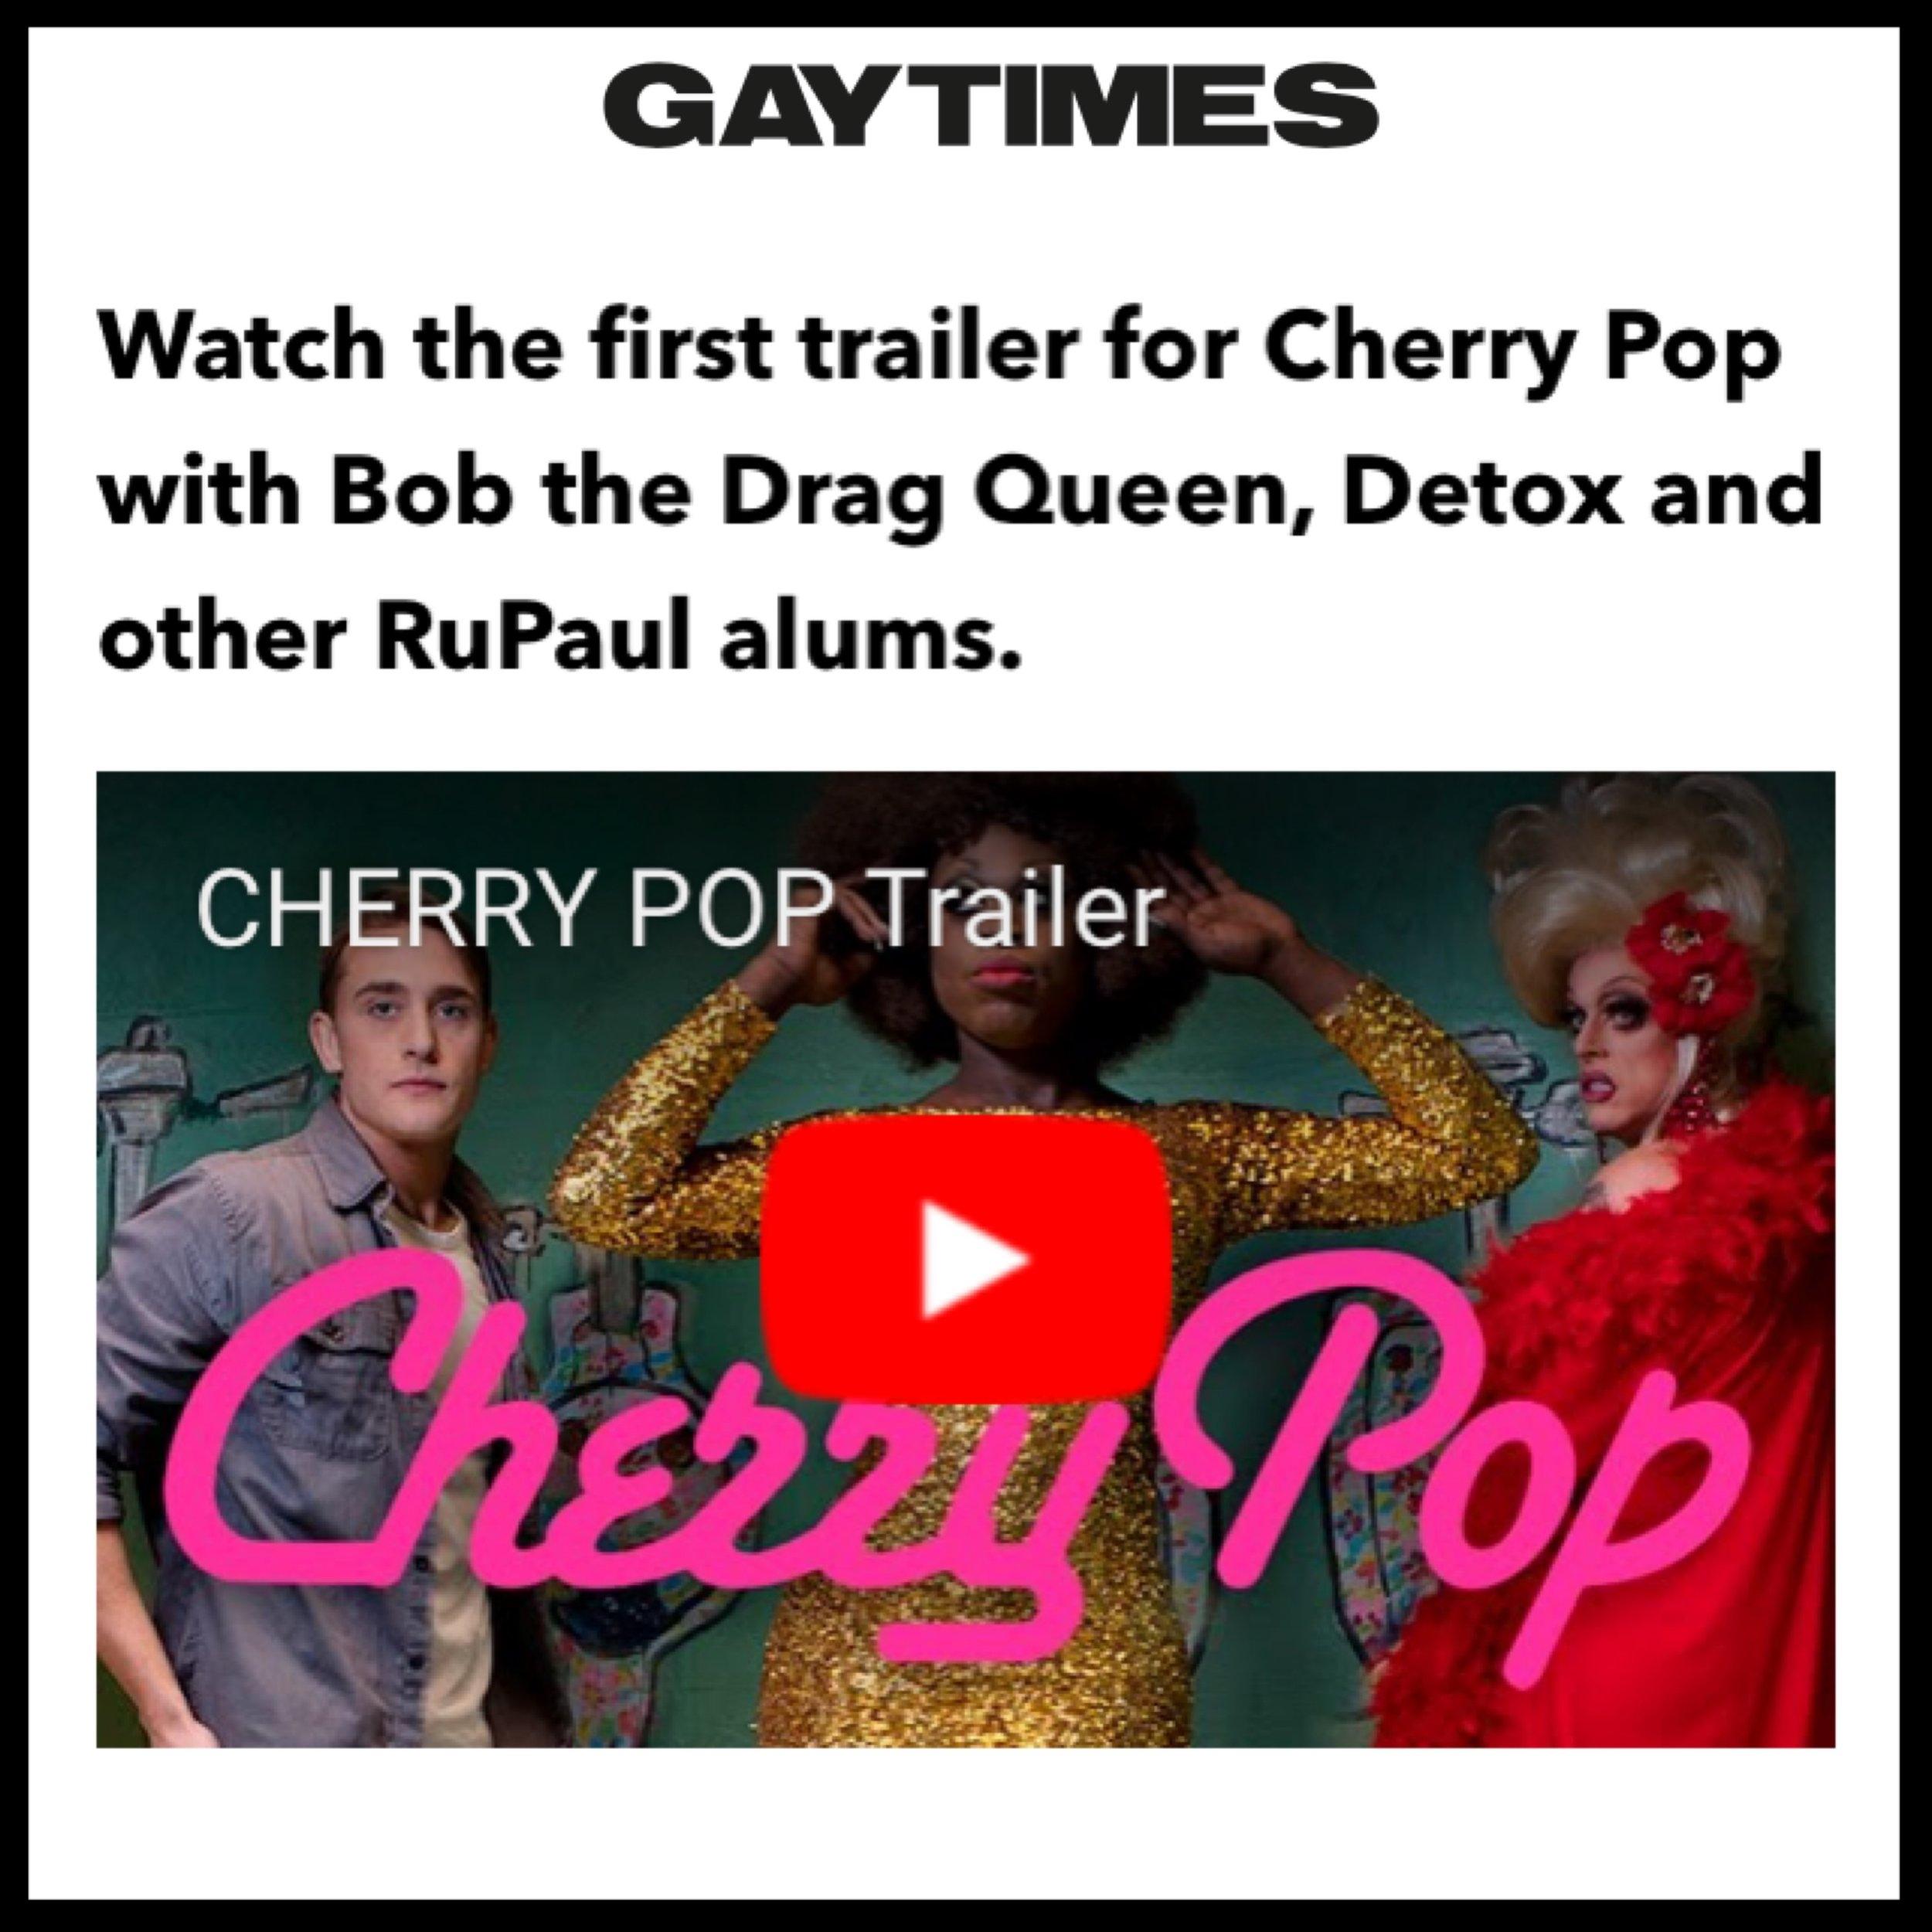 GAY TIMES MAGAZINE (2)